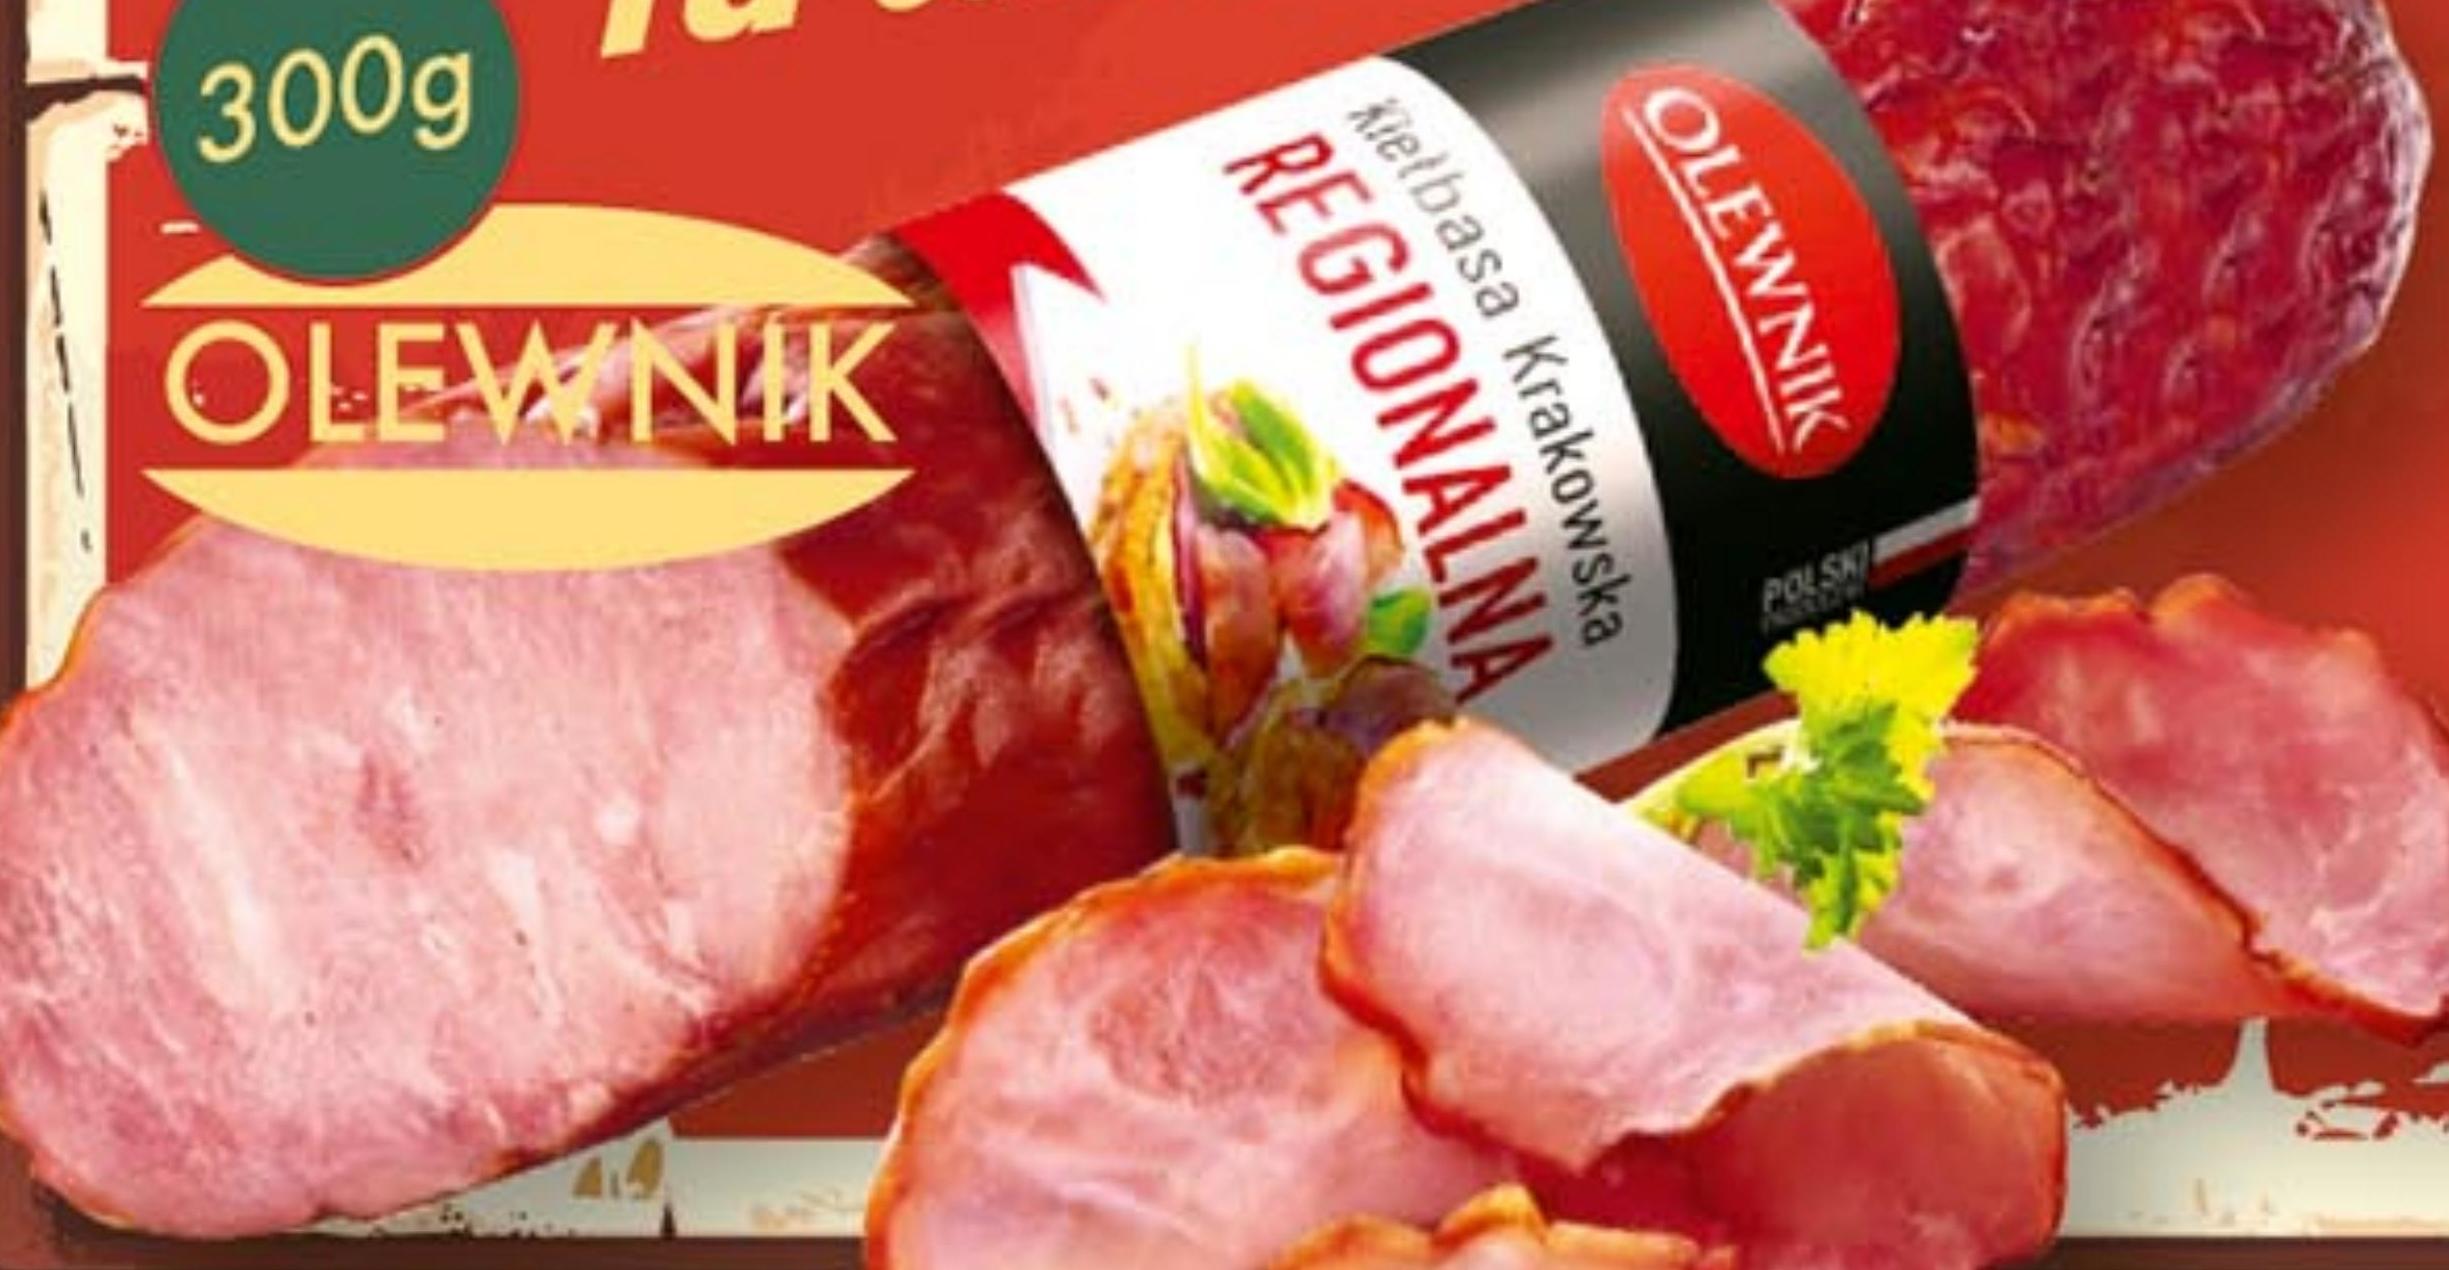 Kiełbasa krakowska Olewnik niska cena